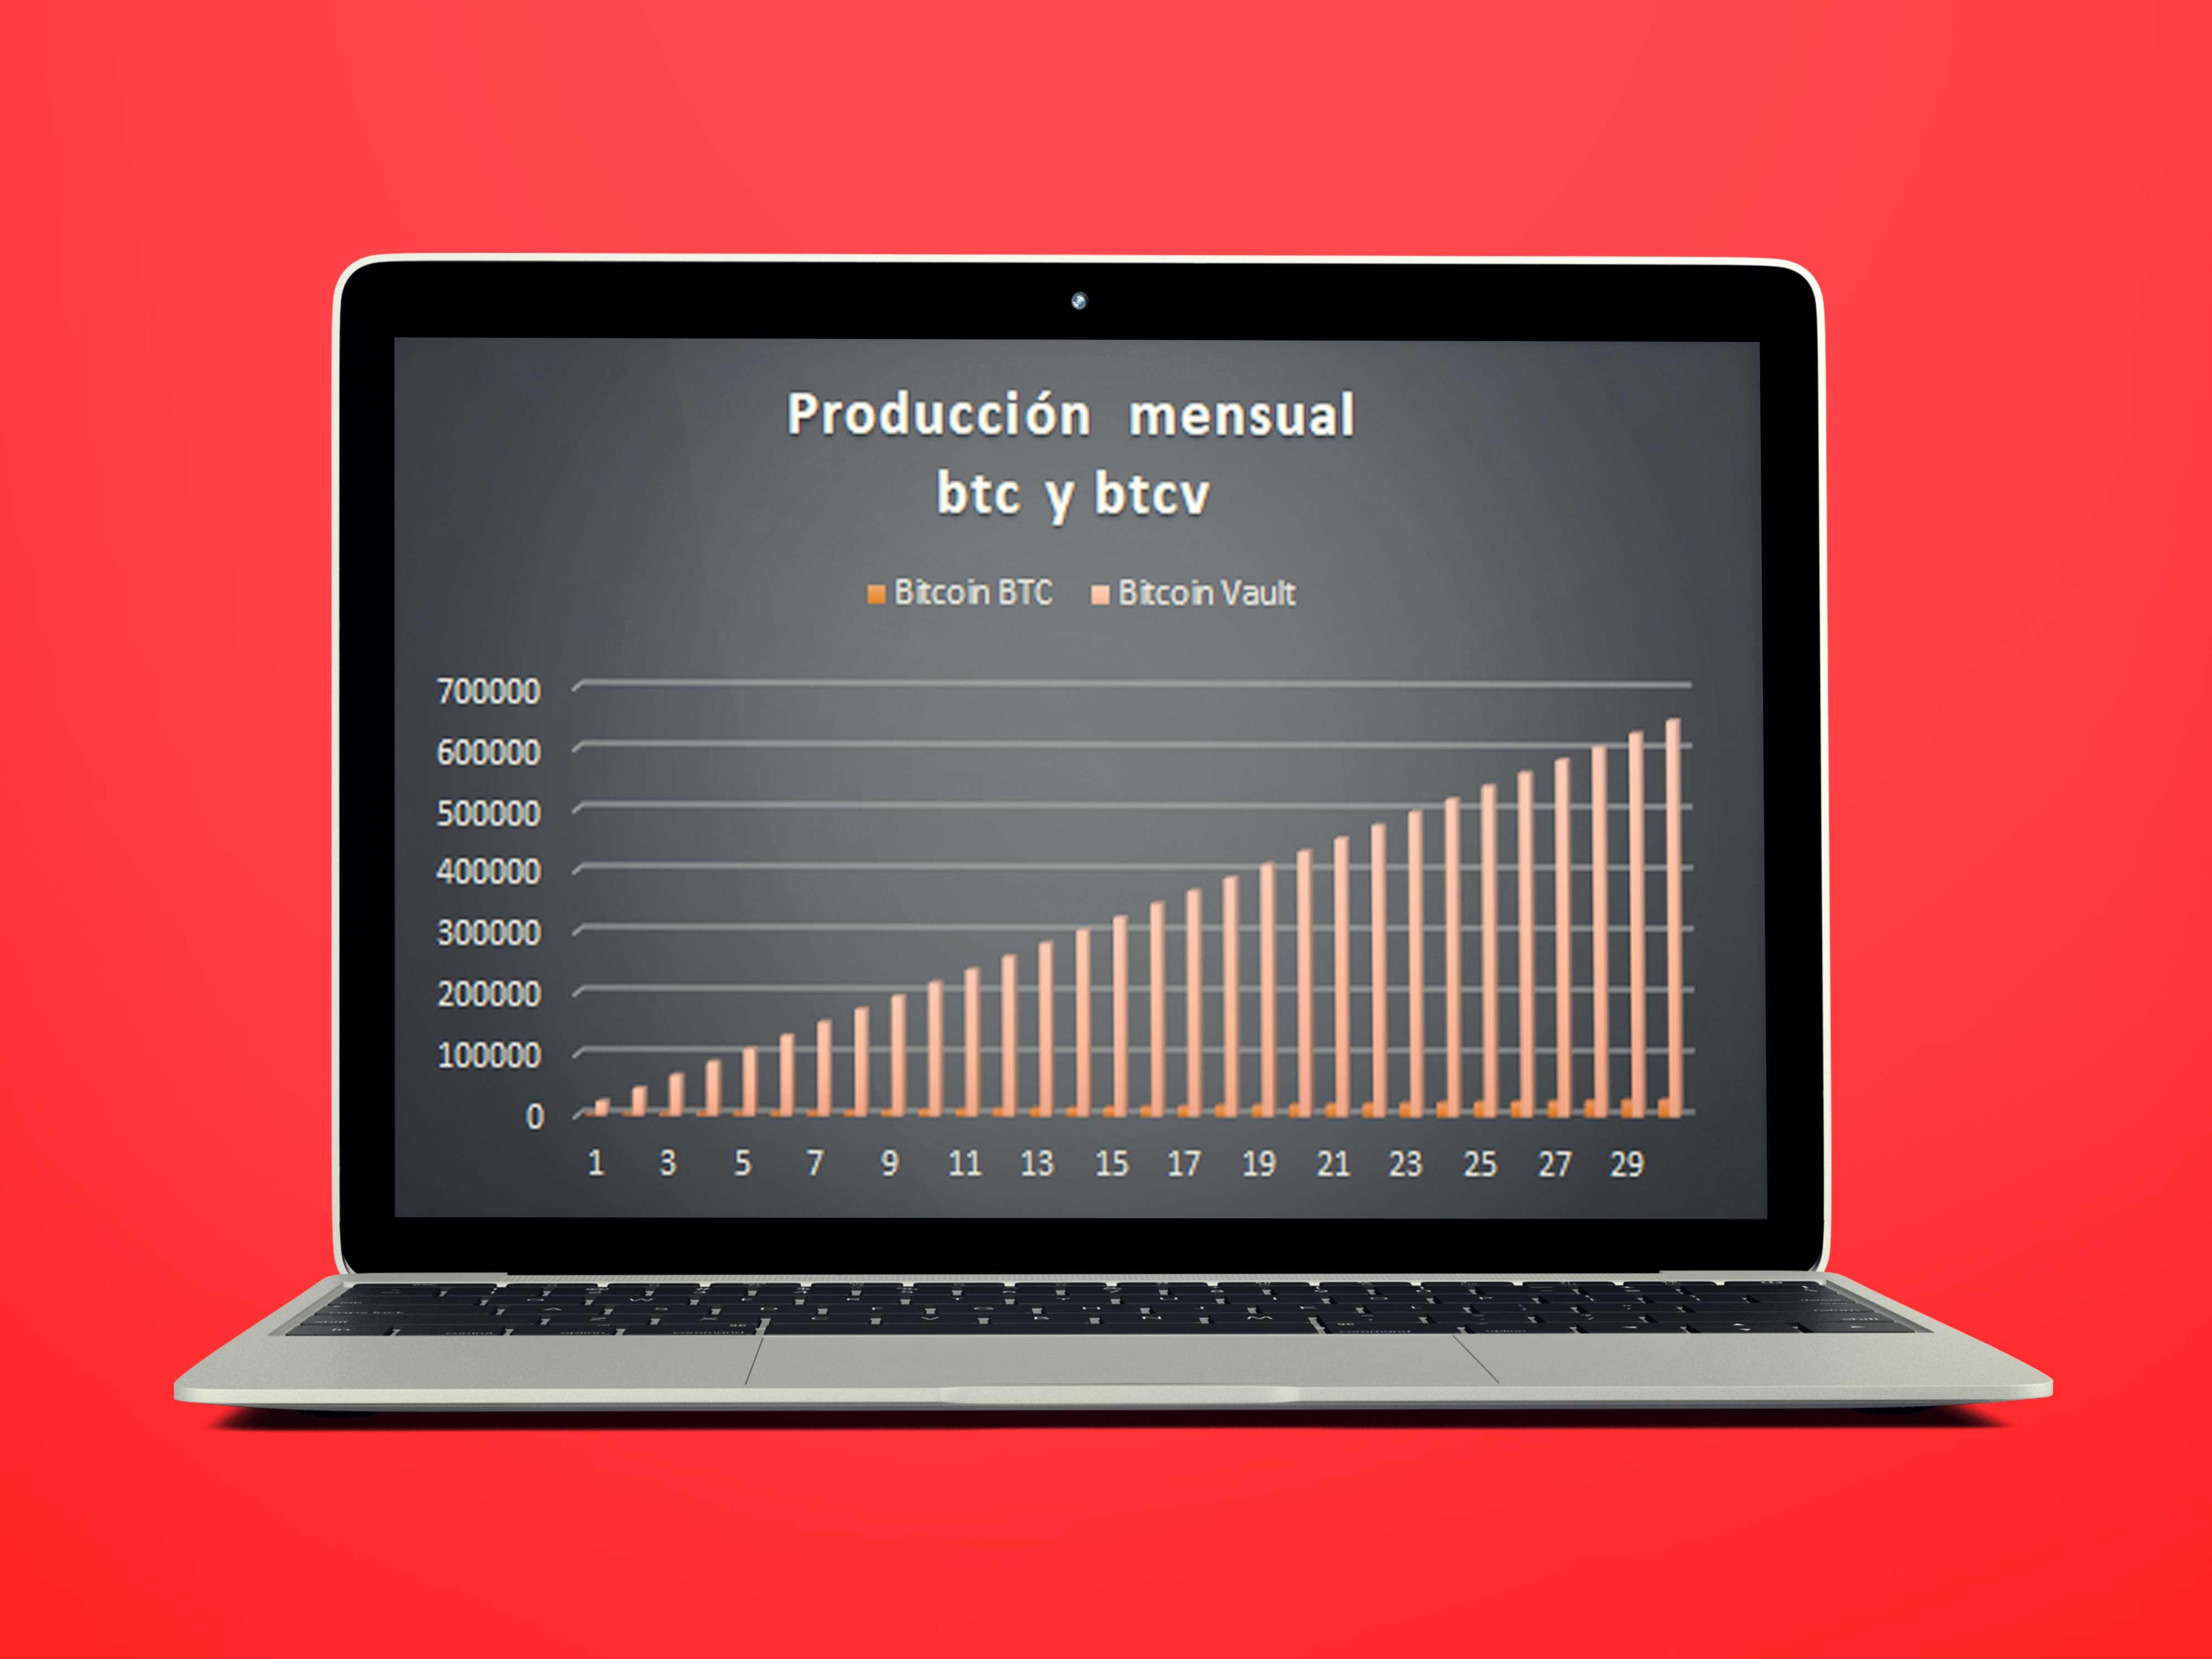 Número de criptomonedas BTC y BTCV que se producen al mes